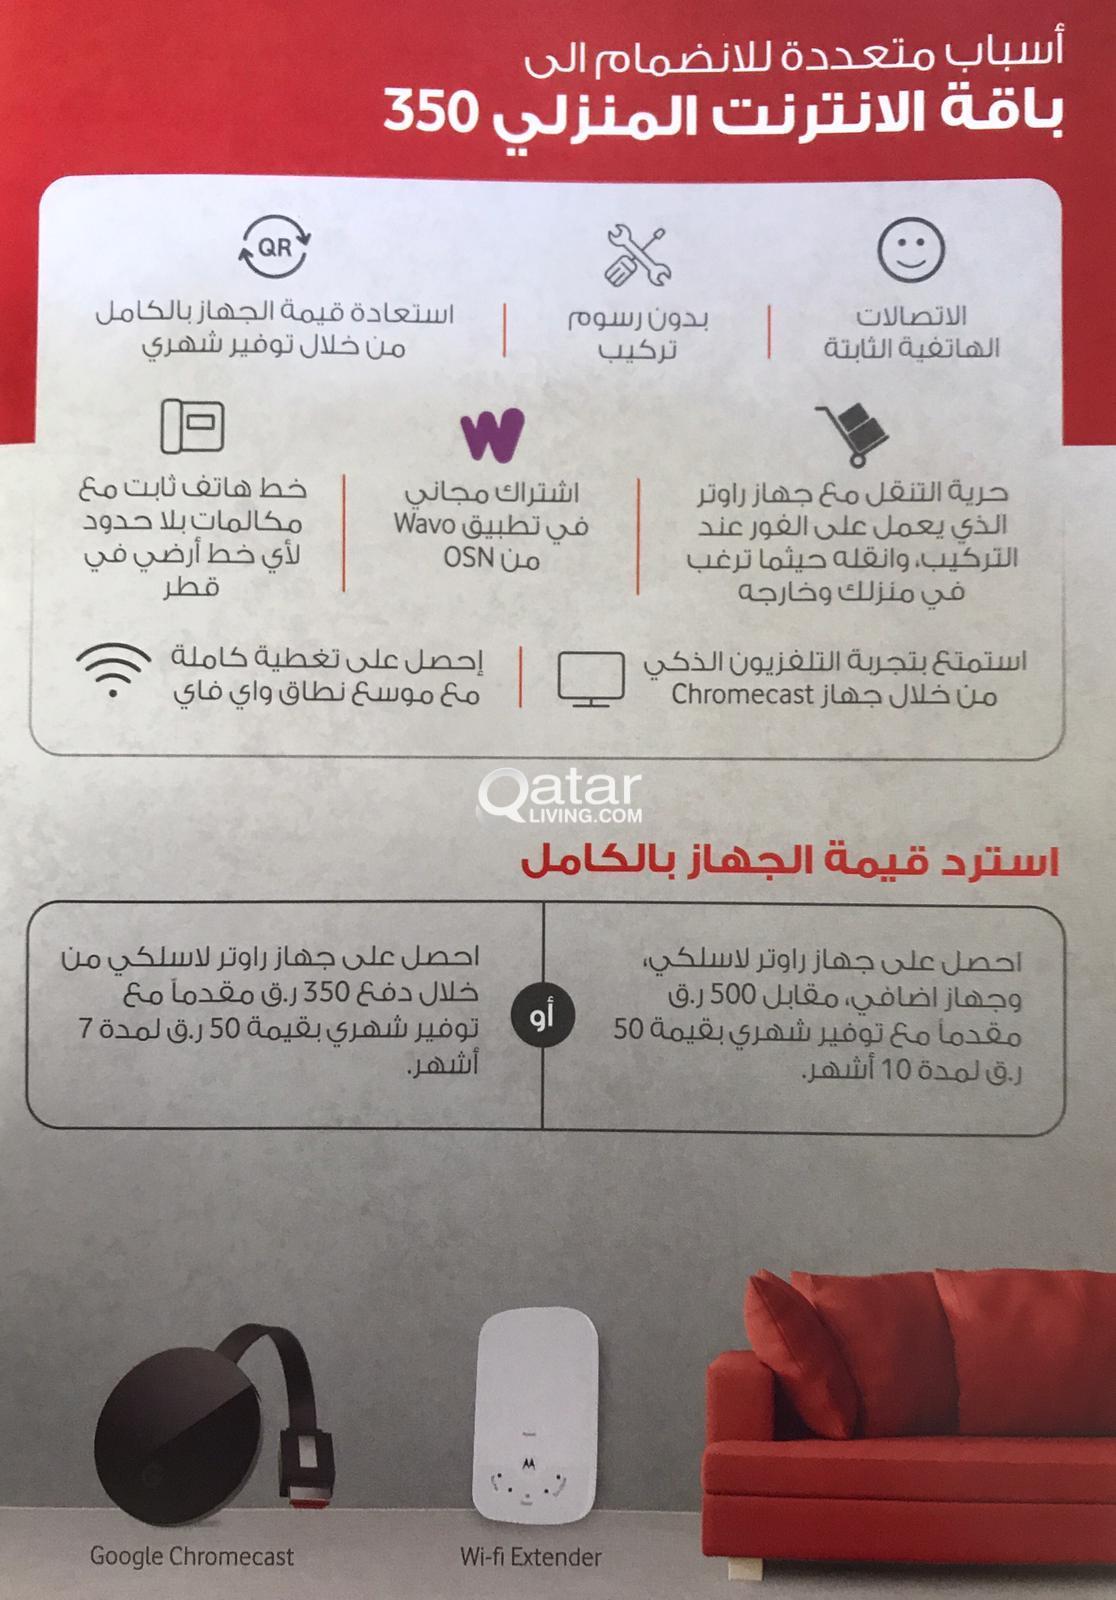 VODAFONE HOME INTERNET PLAN | Qatar Living